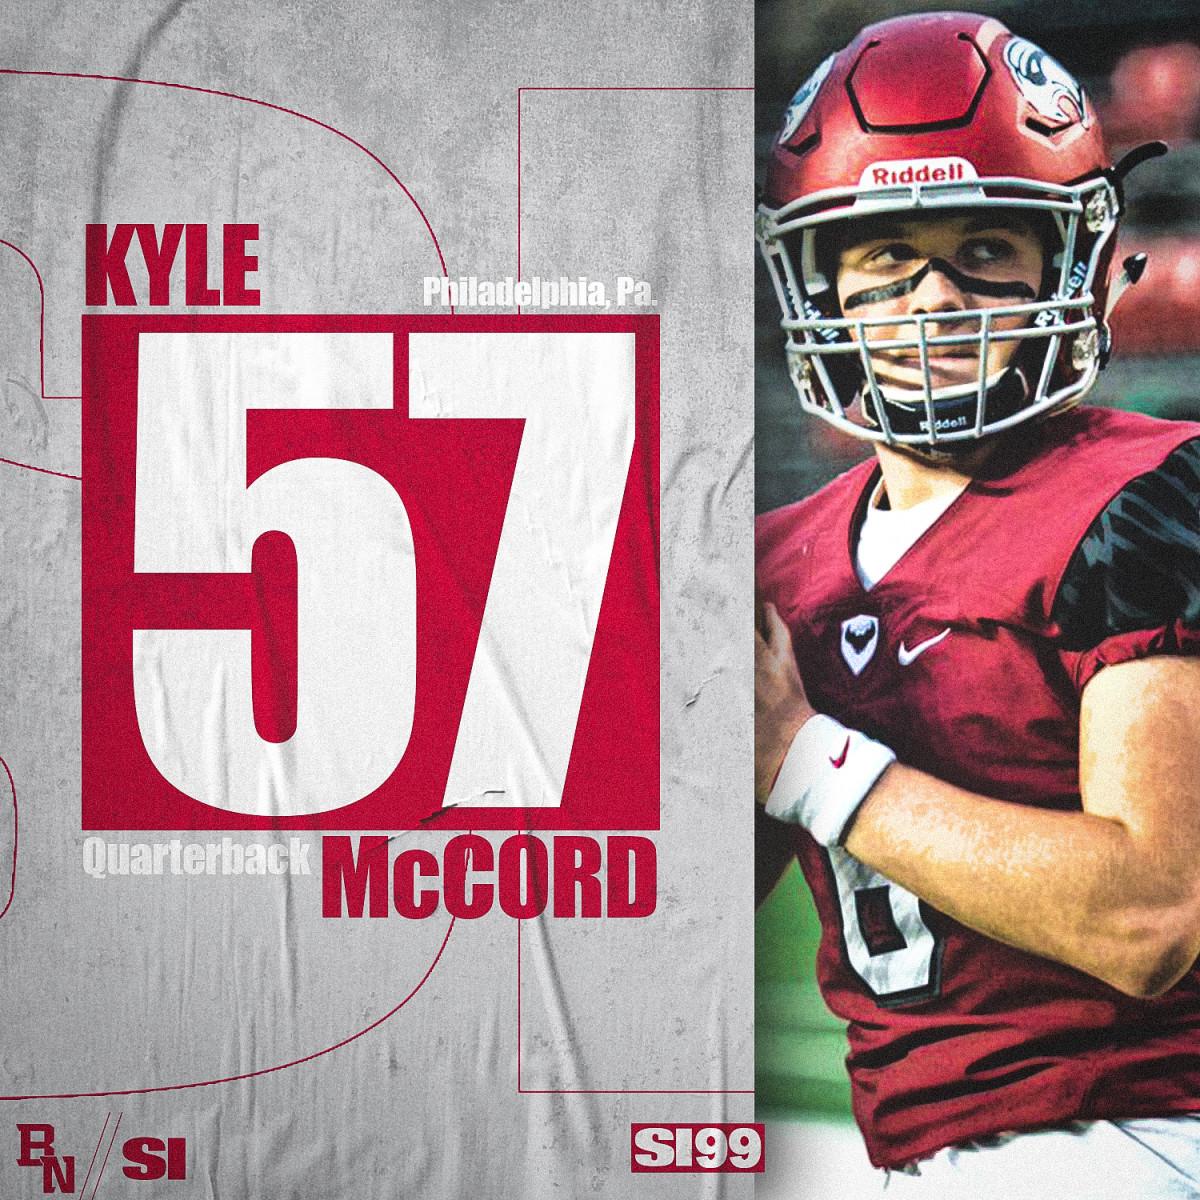 Kyle_McCord